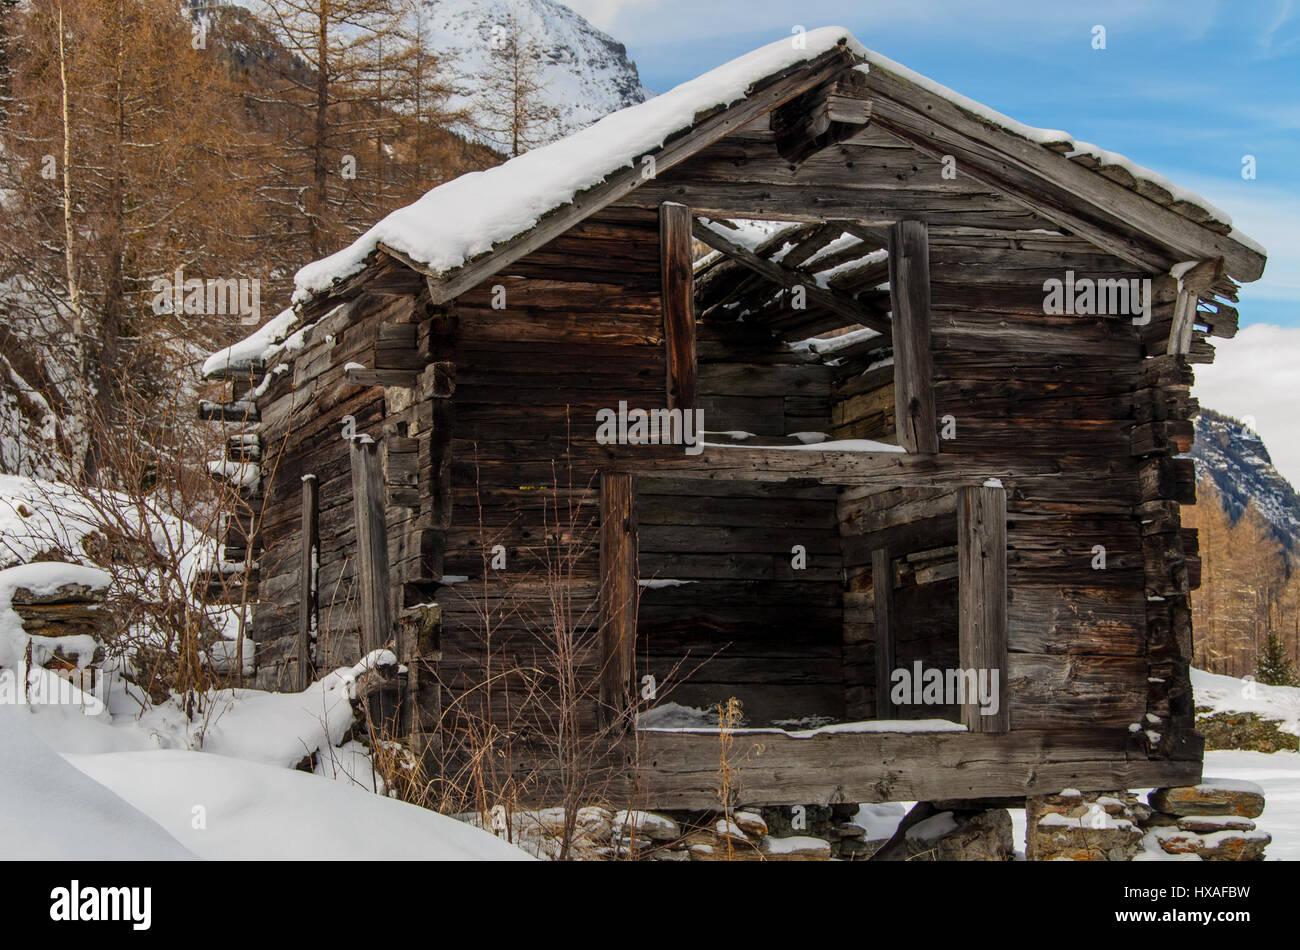 Transient cabins in the neighbourhood of Saas-Almagell. - Stock Image